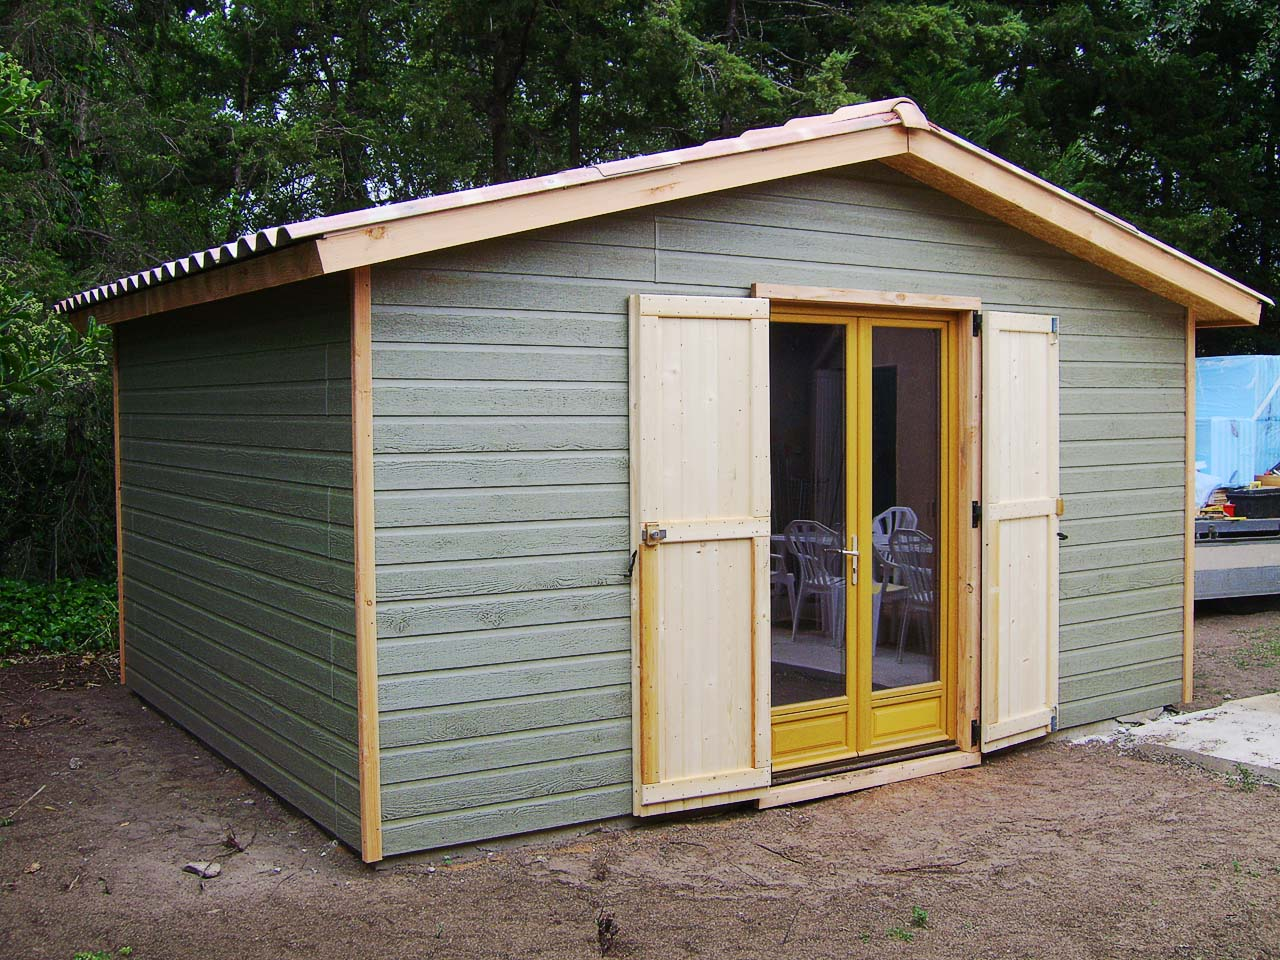 abri piscine coulissant nimes maison design. Black Bedroom Furniture Sets. Home Design Ideas